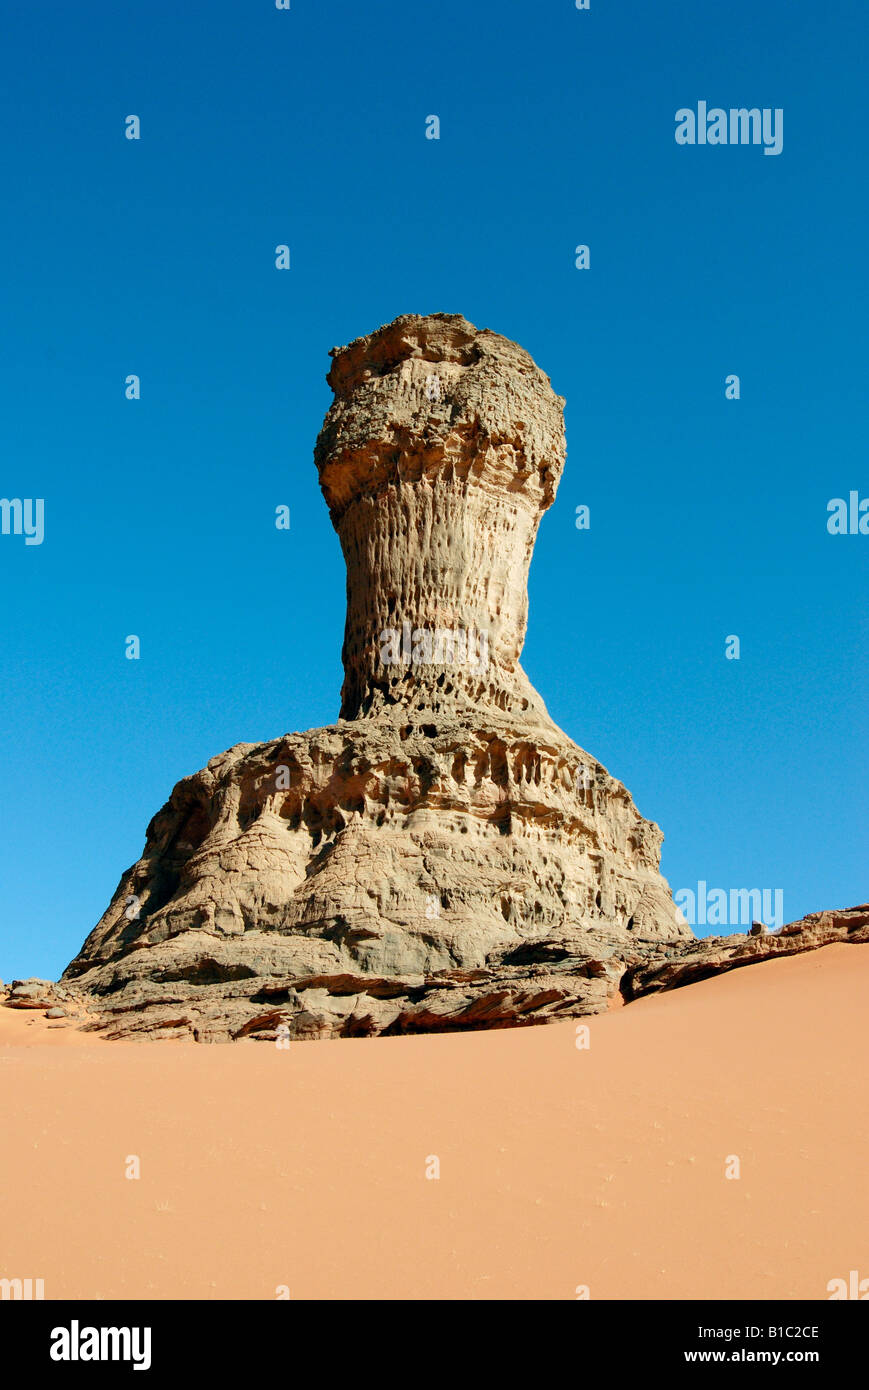 Geografía / viajes, Argelia, paisajes, Tadrart Montaña, roca, columna Additional-Rights-Clearance-Info Imagen De Stock